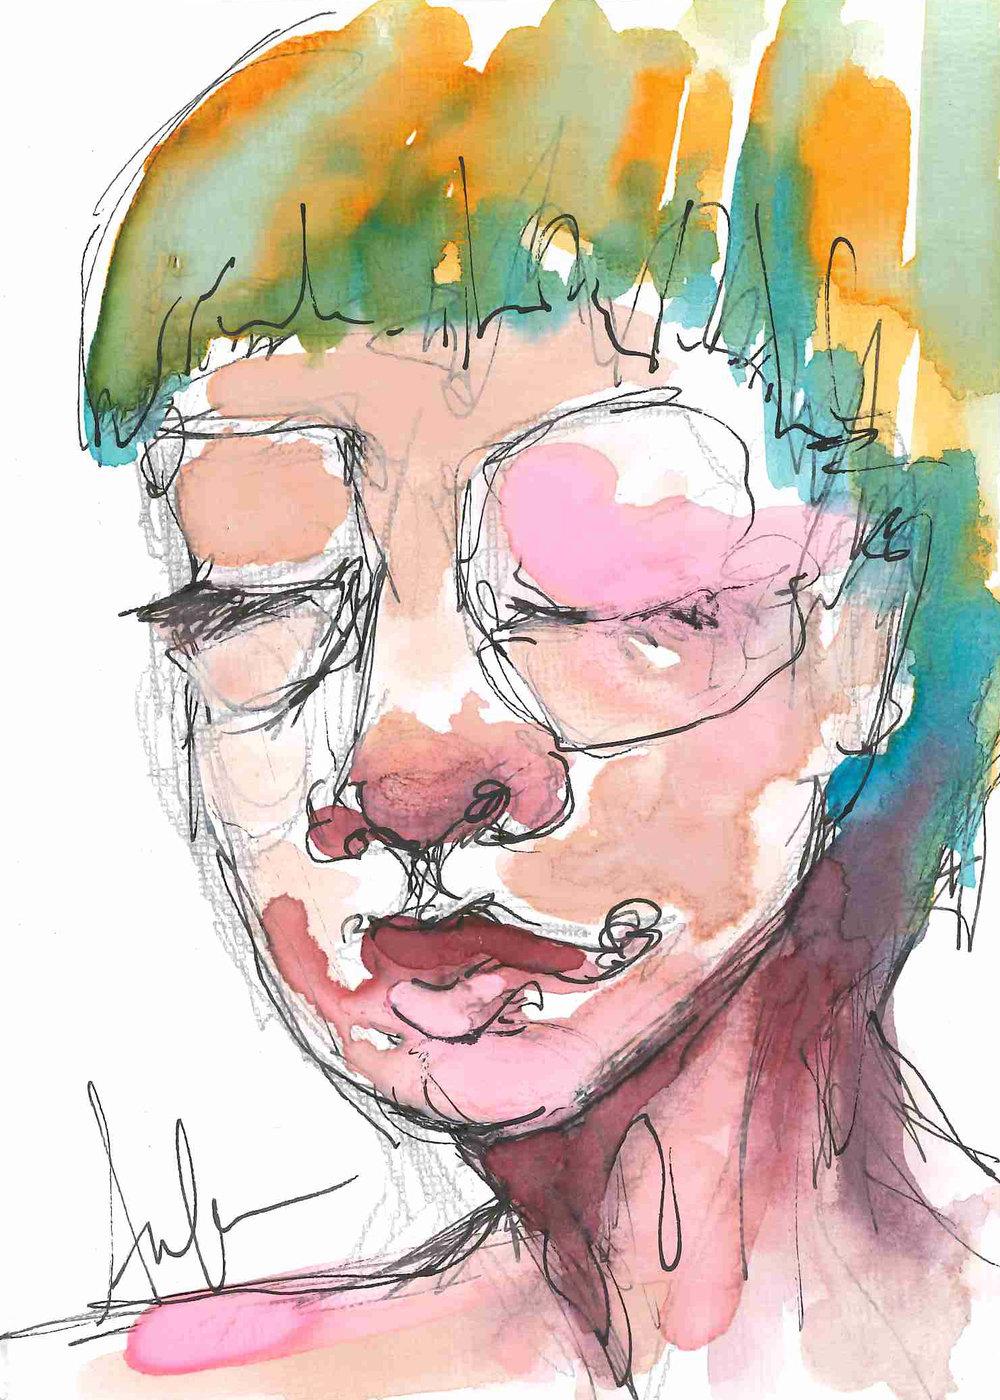 annahooser_5x7 watercolor 2018 (4).jpg